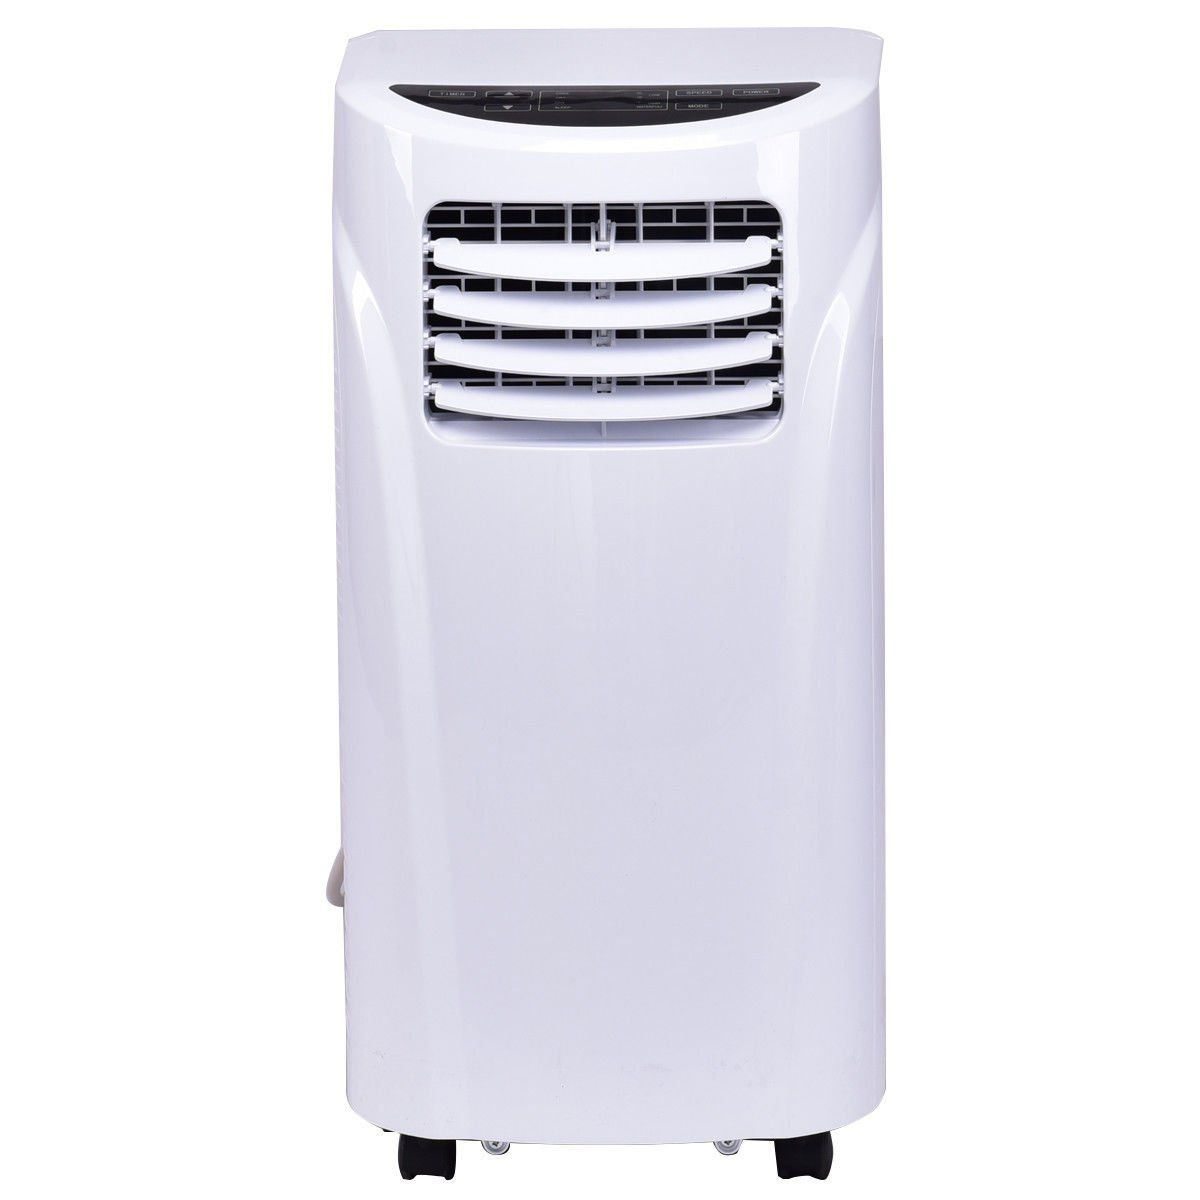 Costway 10000 Btu Portable Air Conditioner With Remote Control Dehumidifier Function Window Wall Mount W Air Conditioner Portable Air Conditioner Dehumidifiers